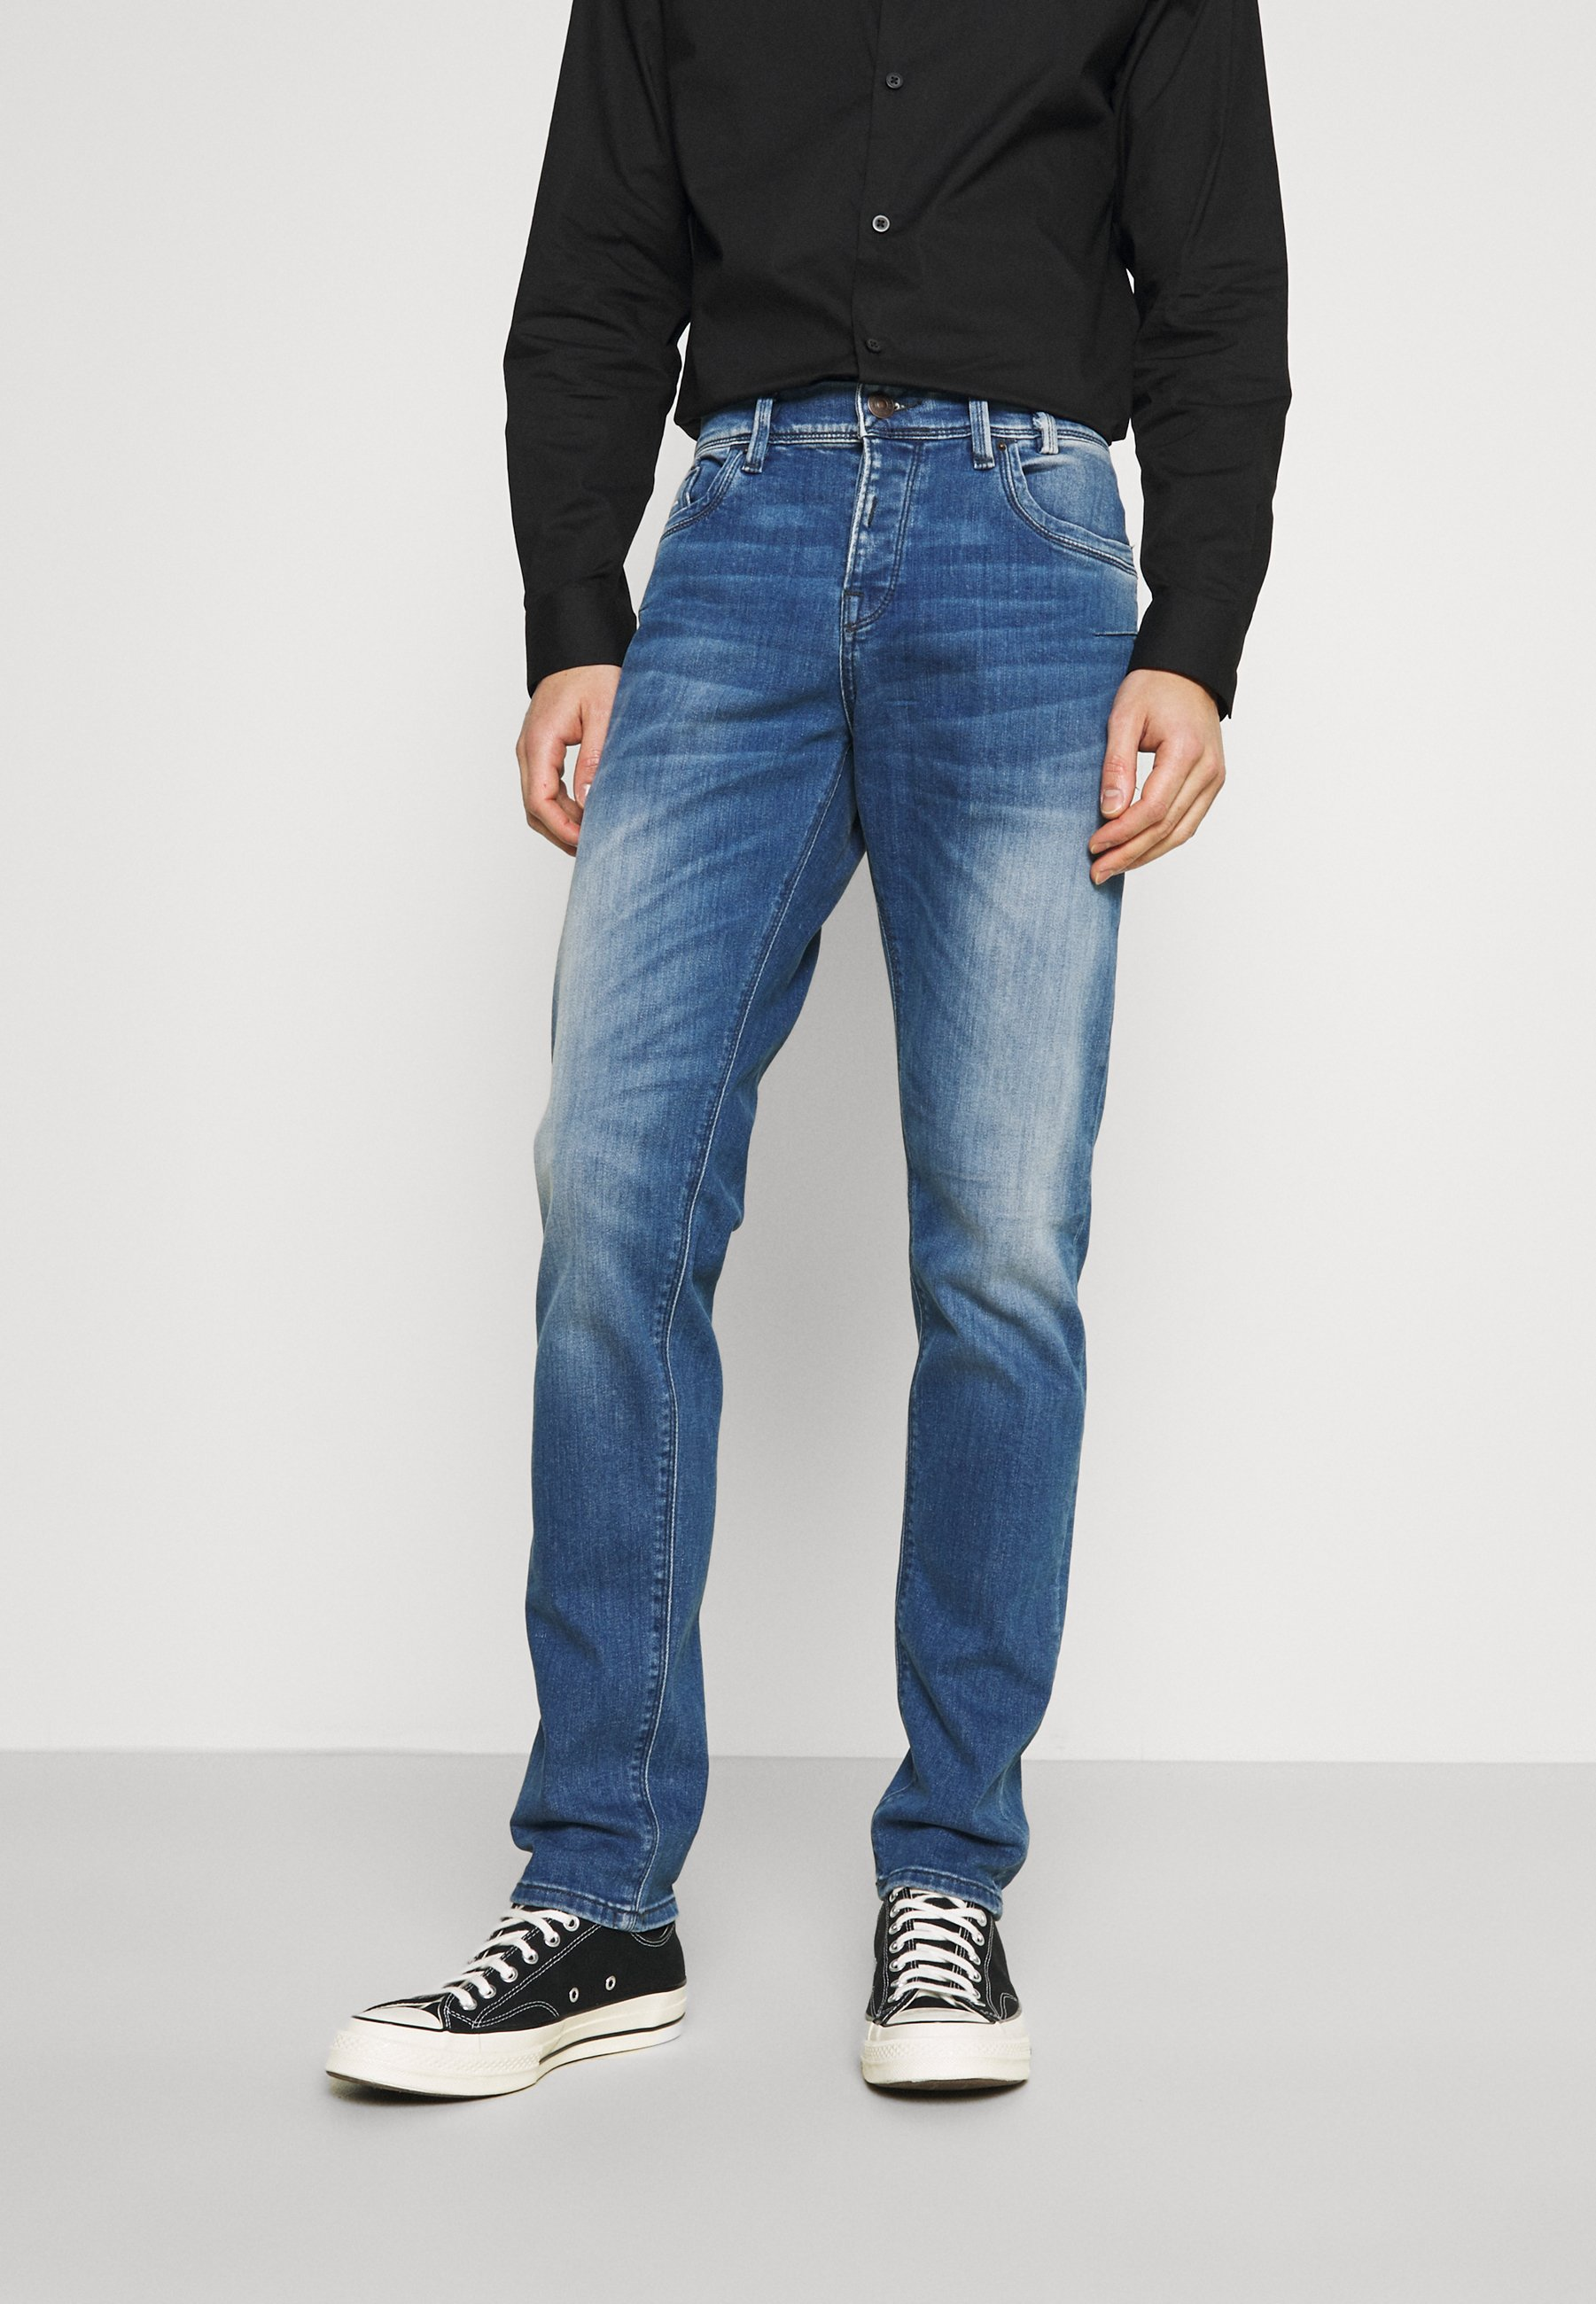 Uomo SERVANDO  - Jeans slim fit